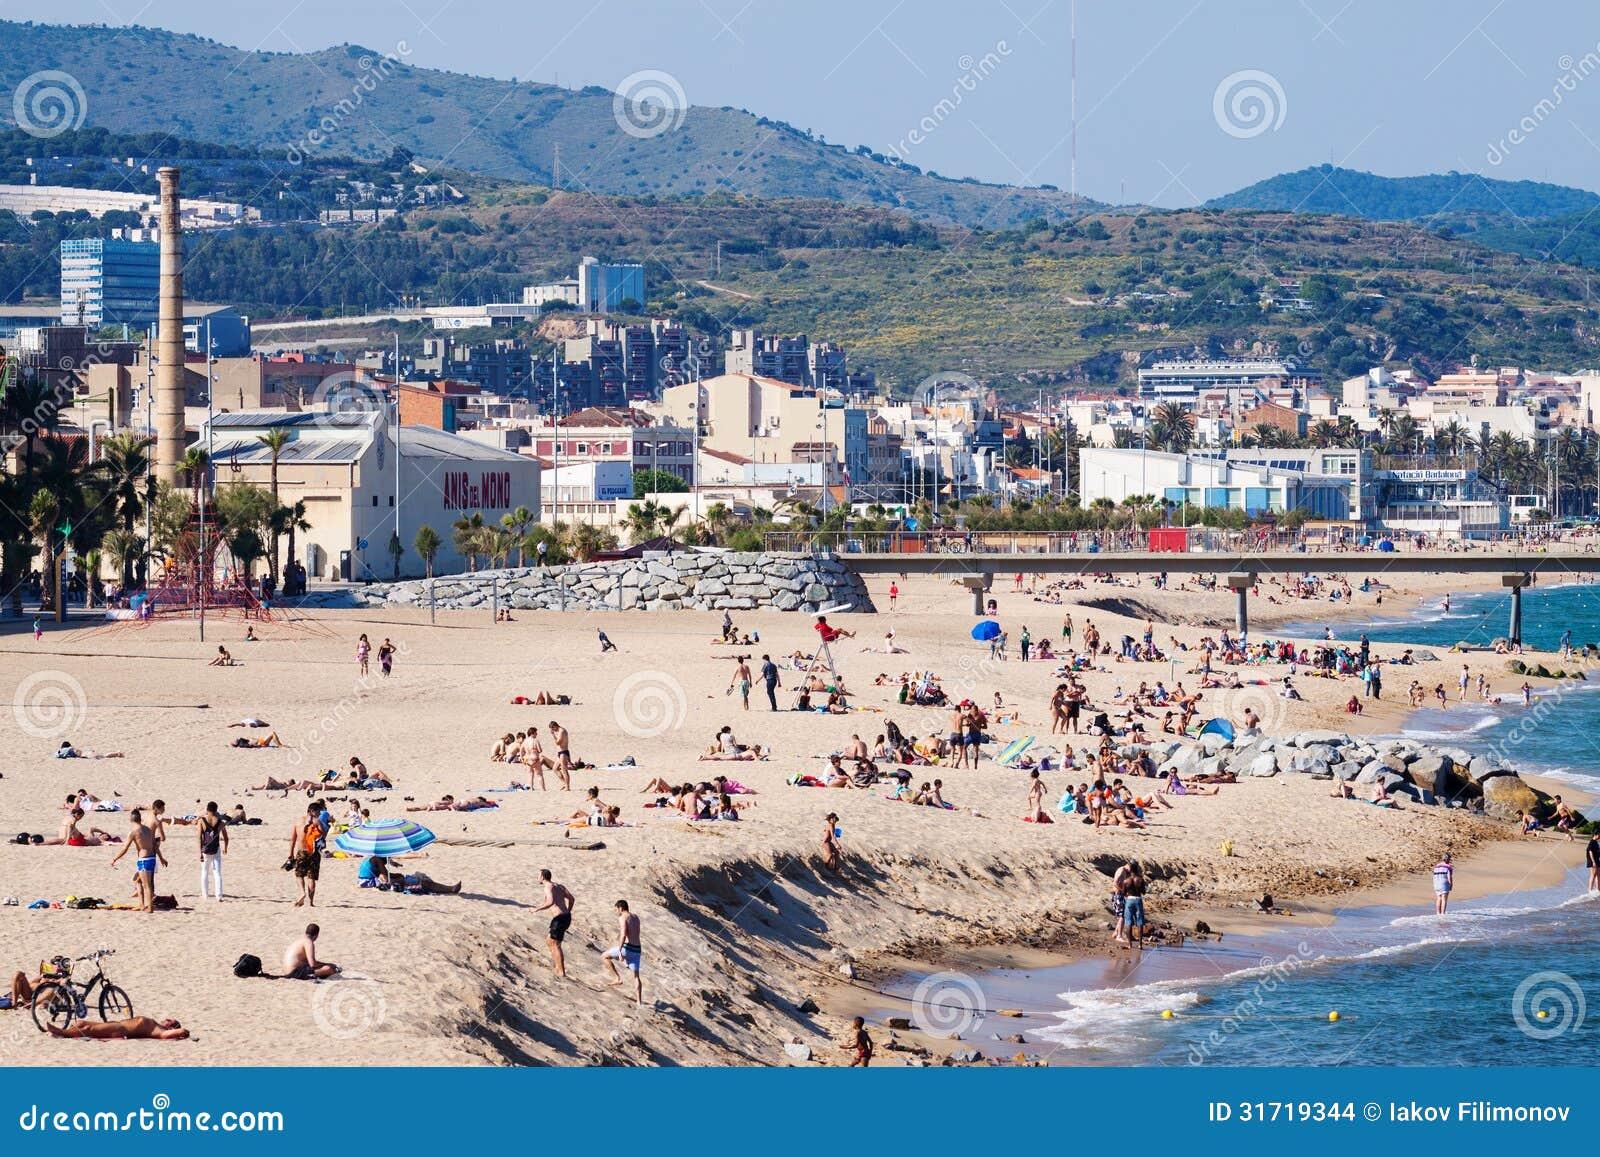 Hotels In Badalona Spain